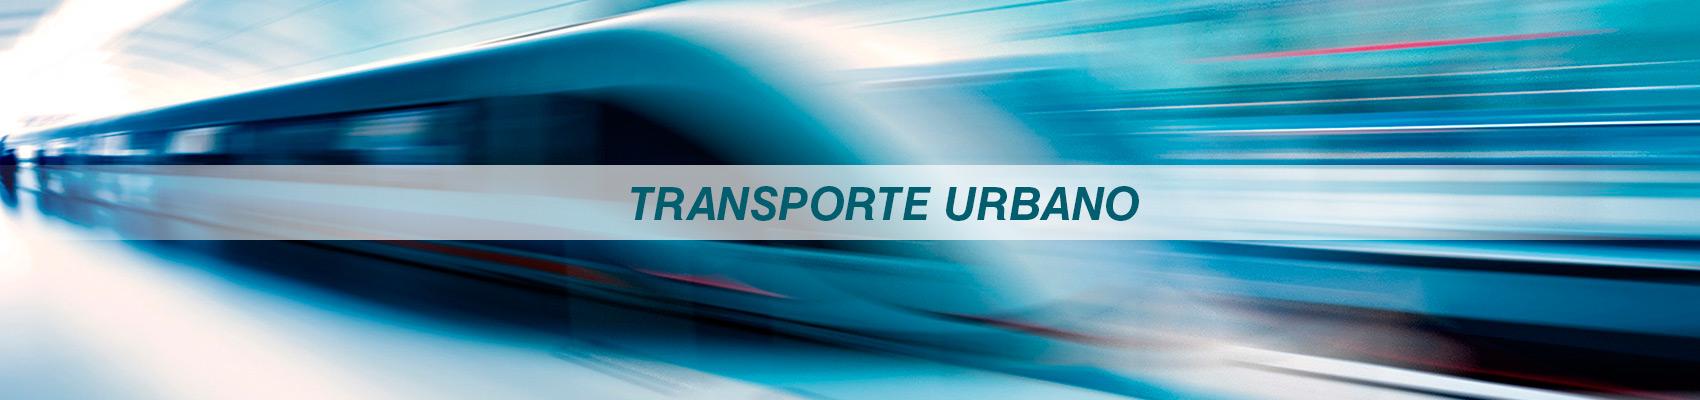 TRANSPORTE-URBANO